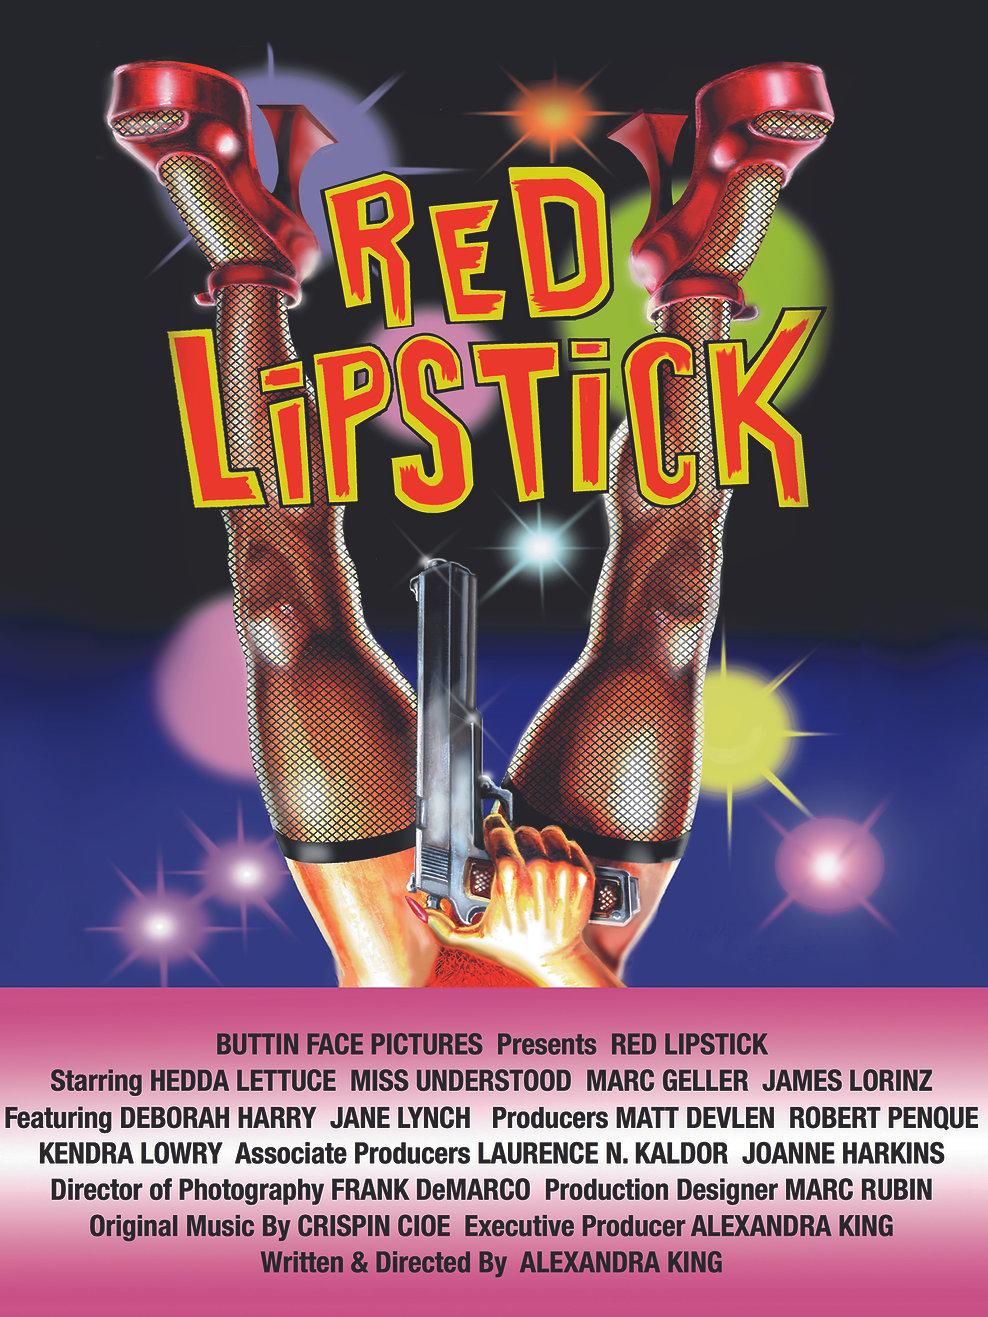 Red Lipstick The Movie Poster Starring Hedda Lettuce & Miss Understood